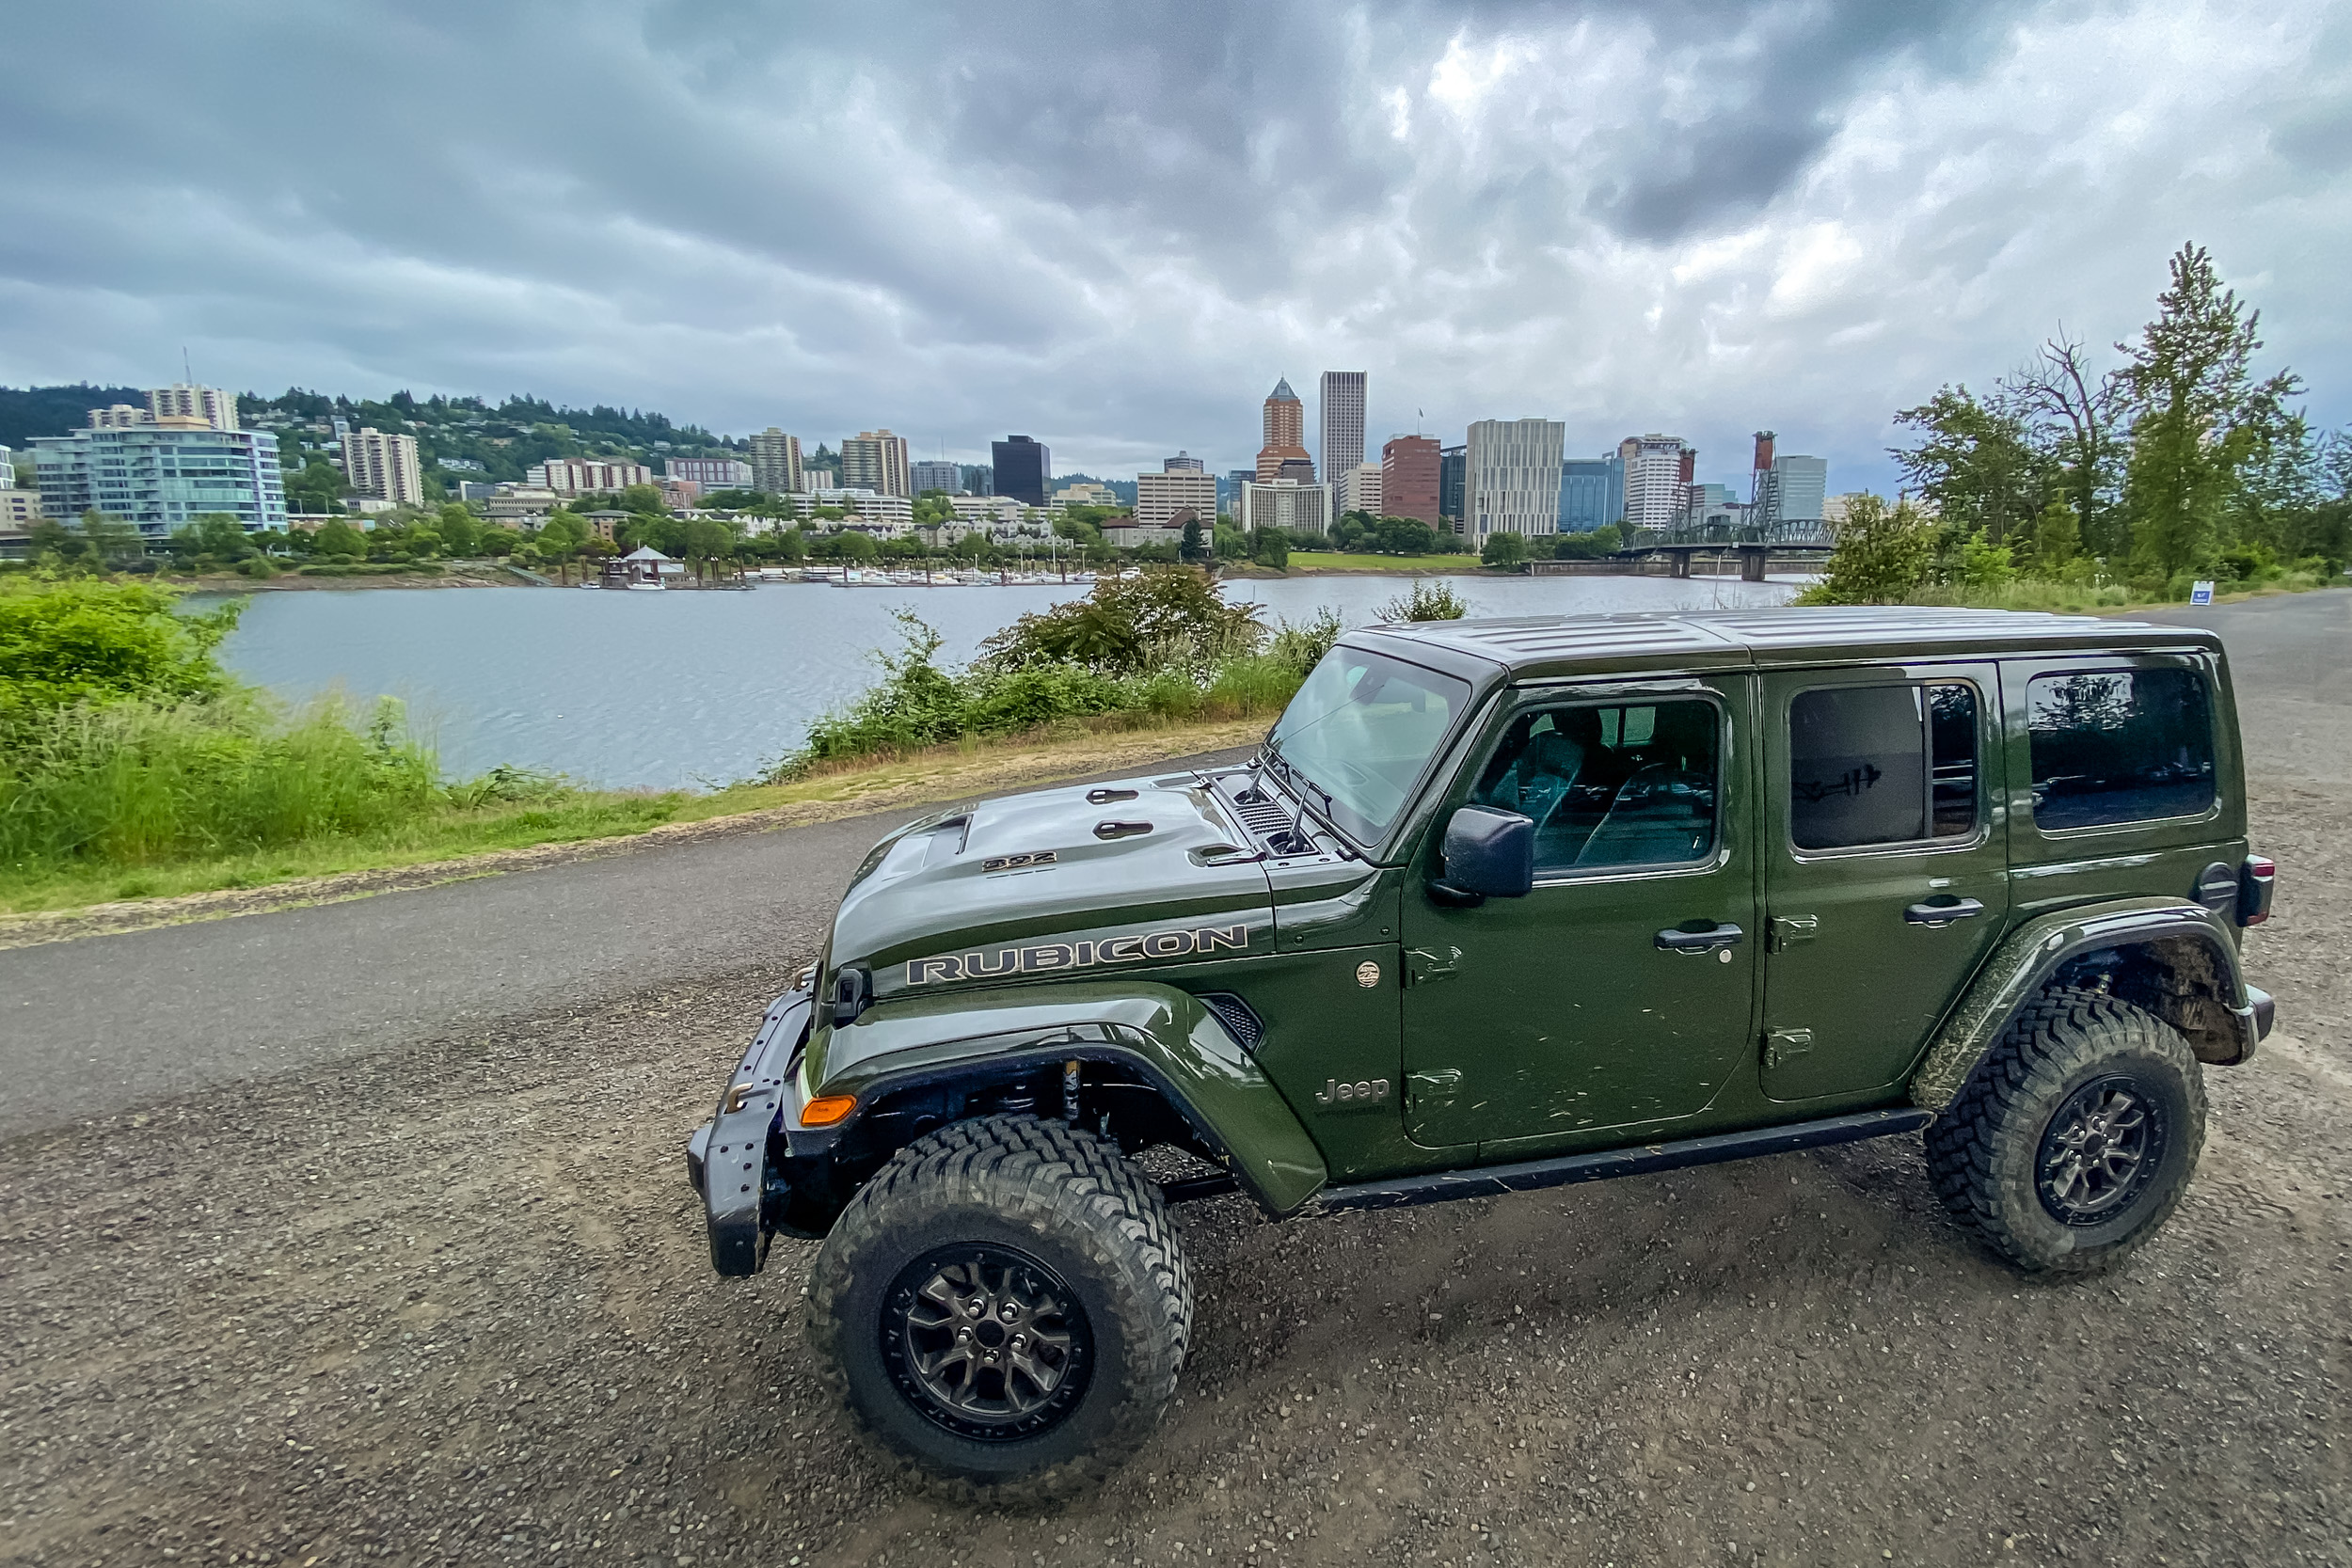 2021 Jeep Wrangler Rubicon 392 Portland city skyline